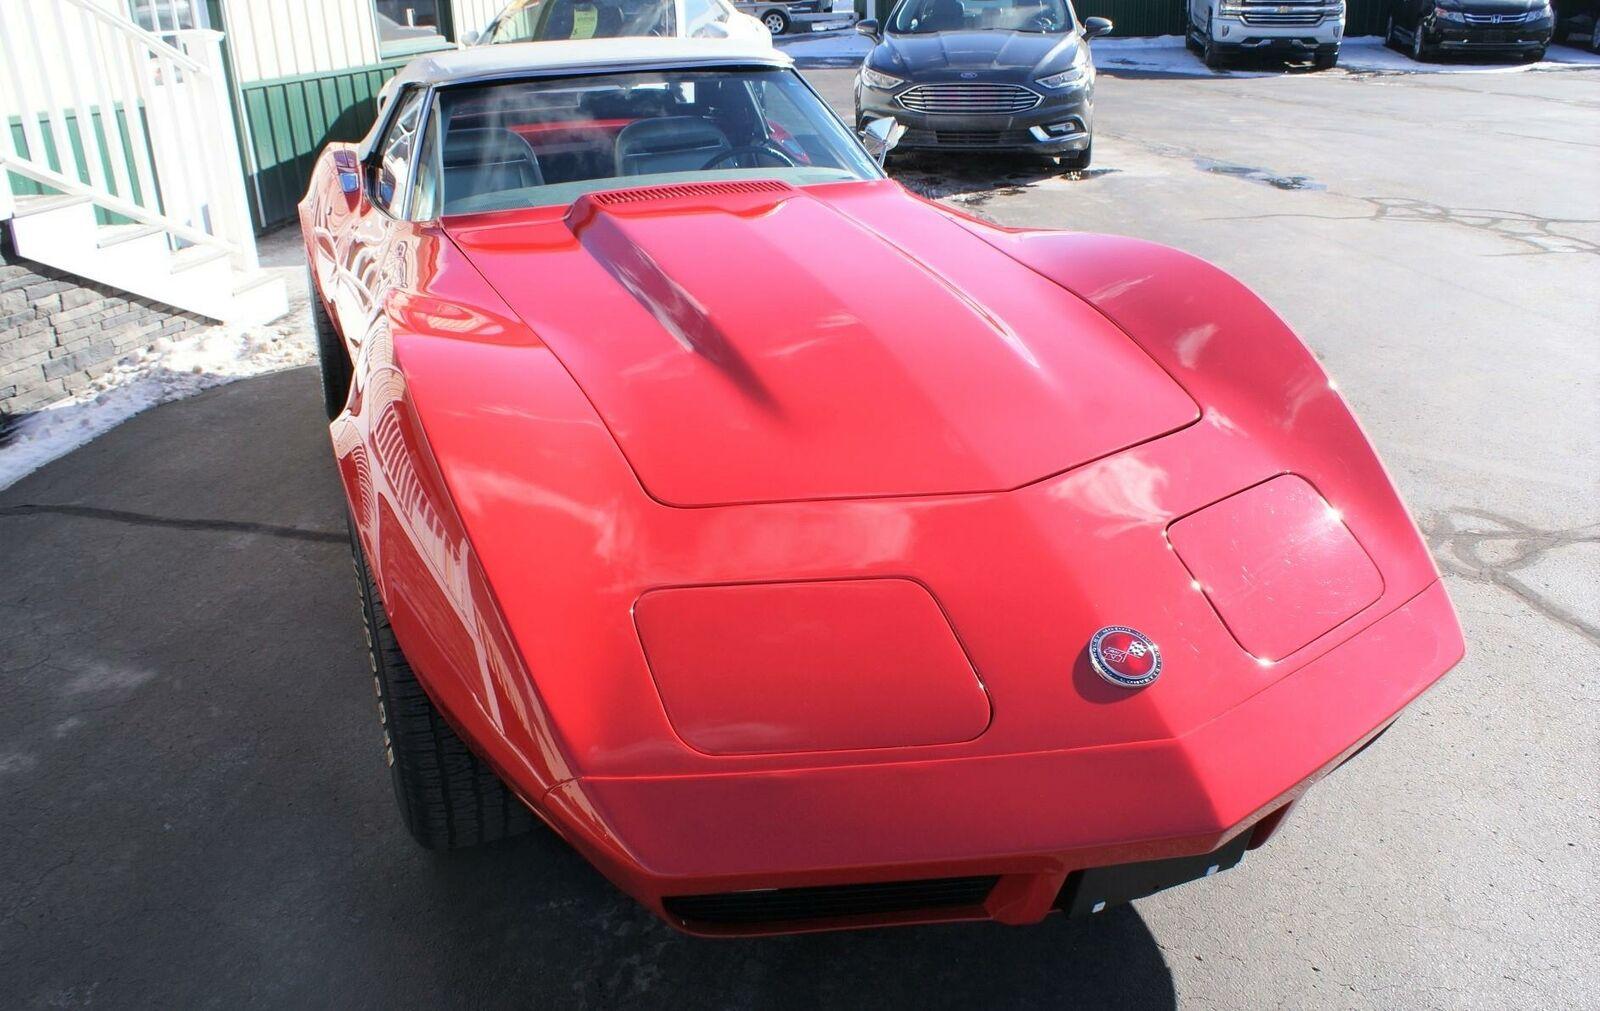 1974 Red Chevrolet Corvette  L82   C3 Corvette Photo 6